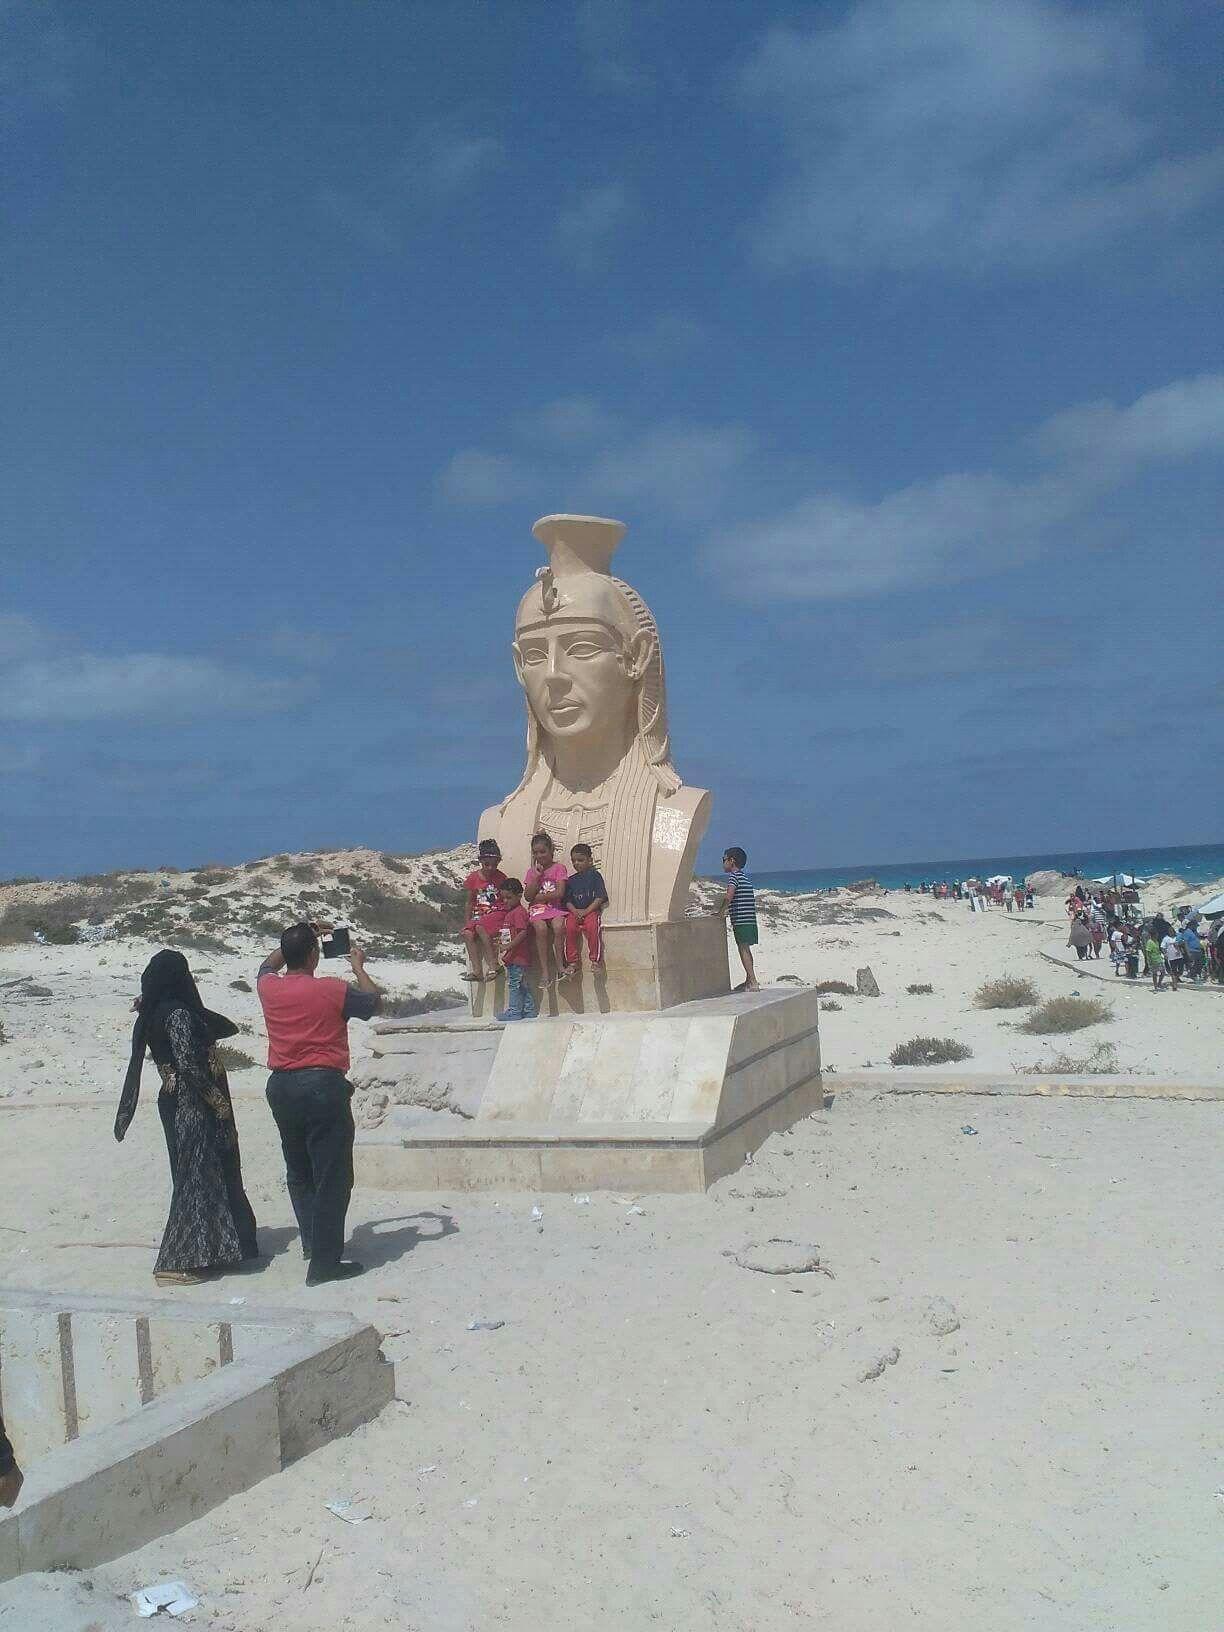 حمام كليوباترا شاطىء بمرسى مطروح وتمثال لهاmarsa Matruh Northwest Egypt Cleopatra Sea Alessandria Egypt Ancient Egypt